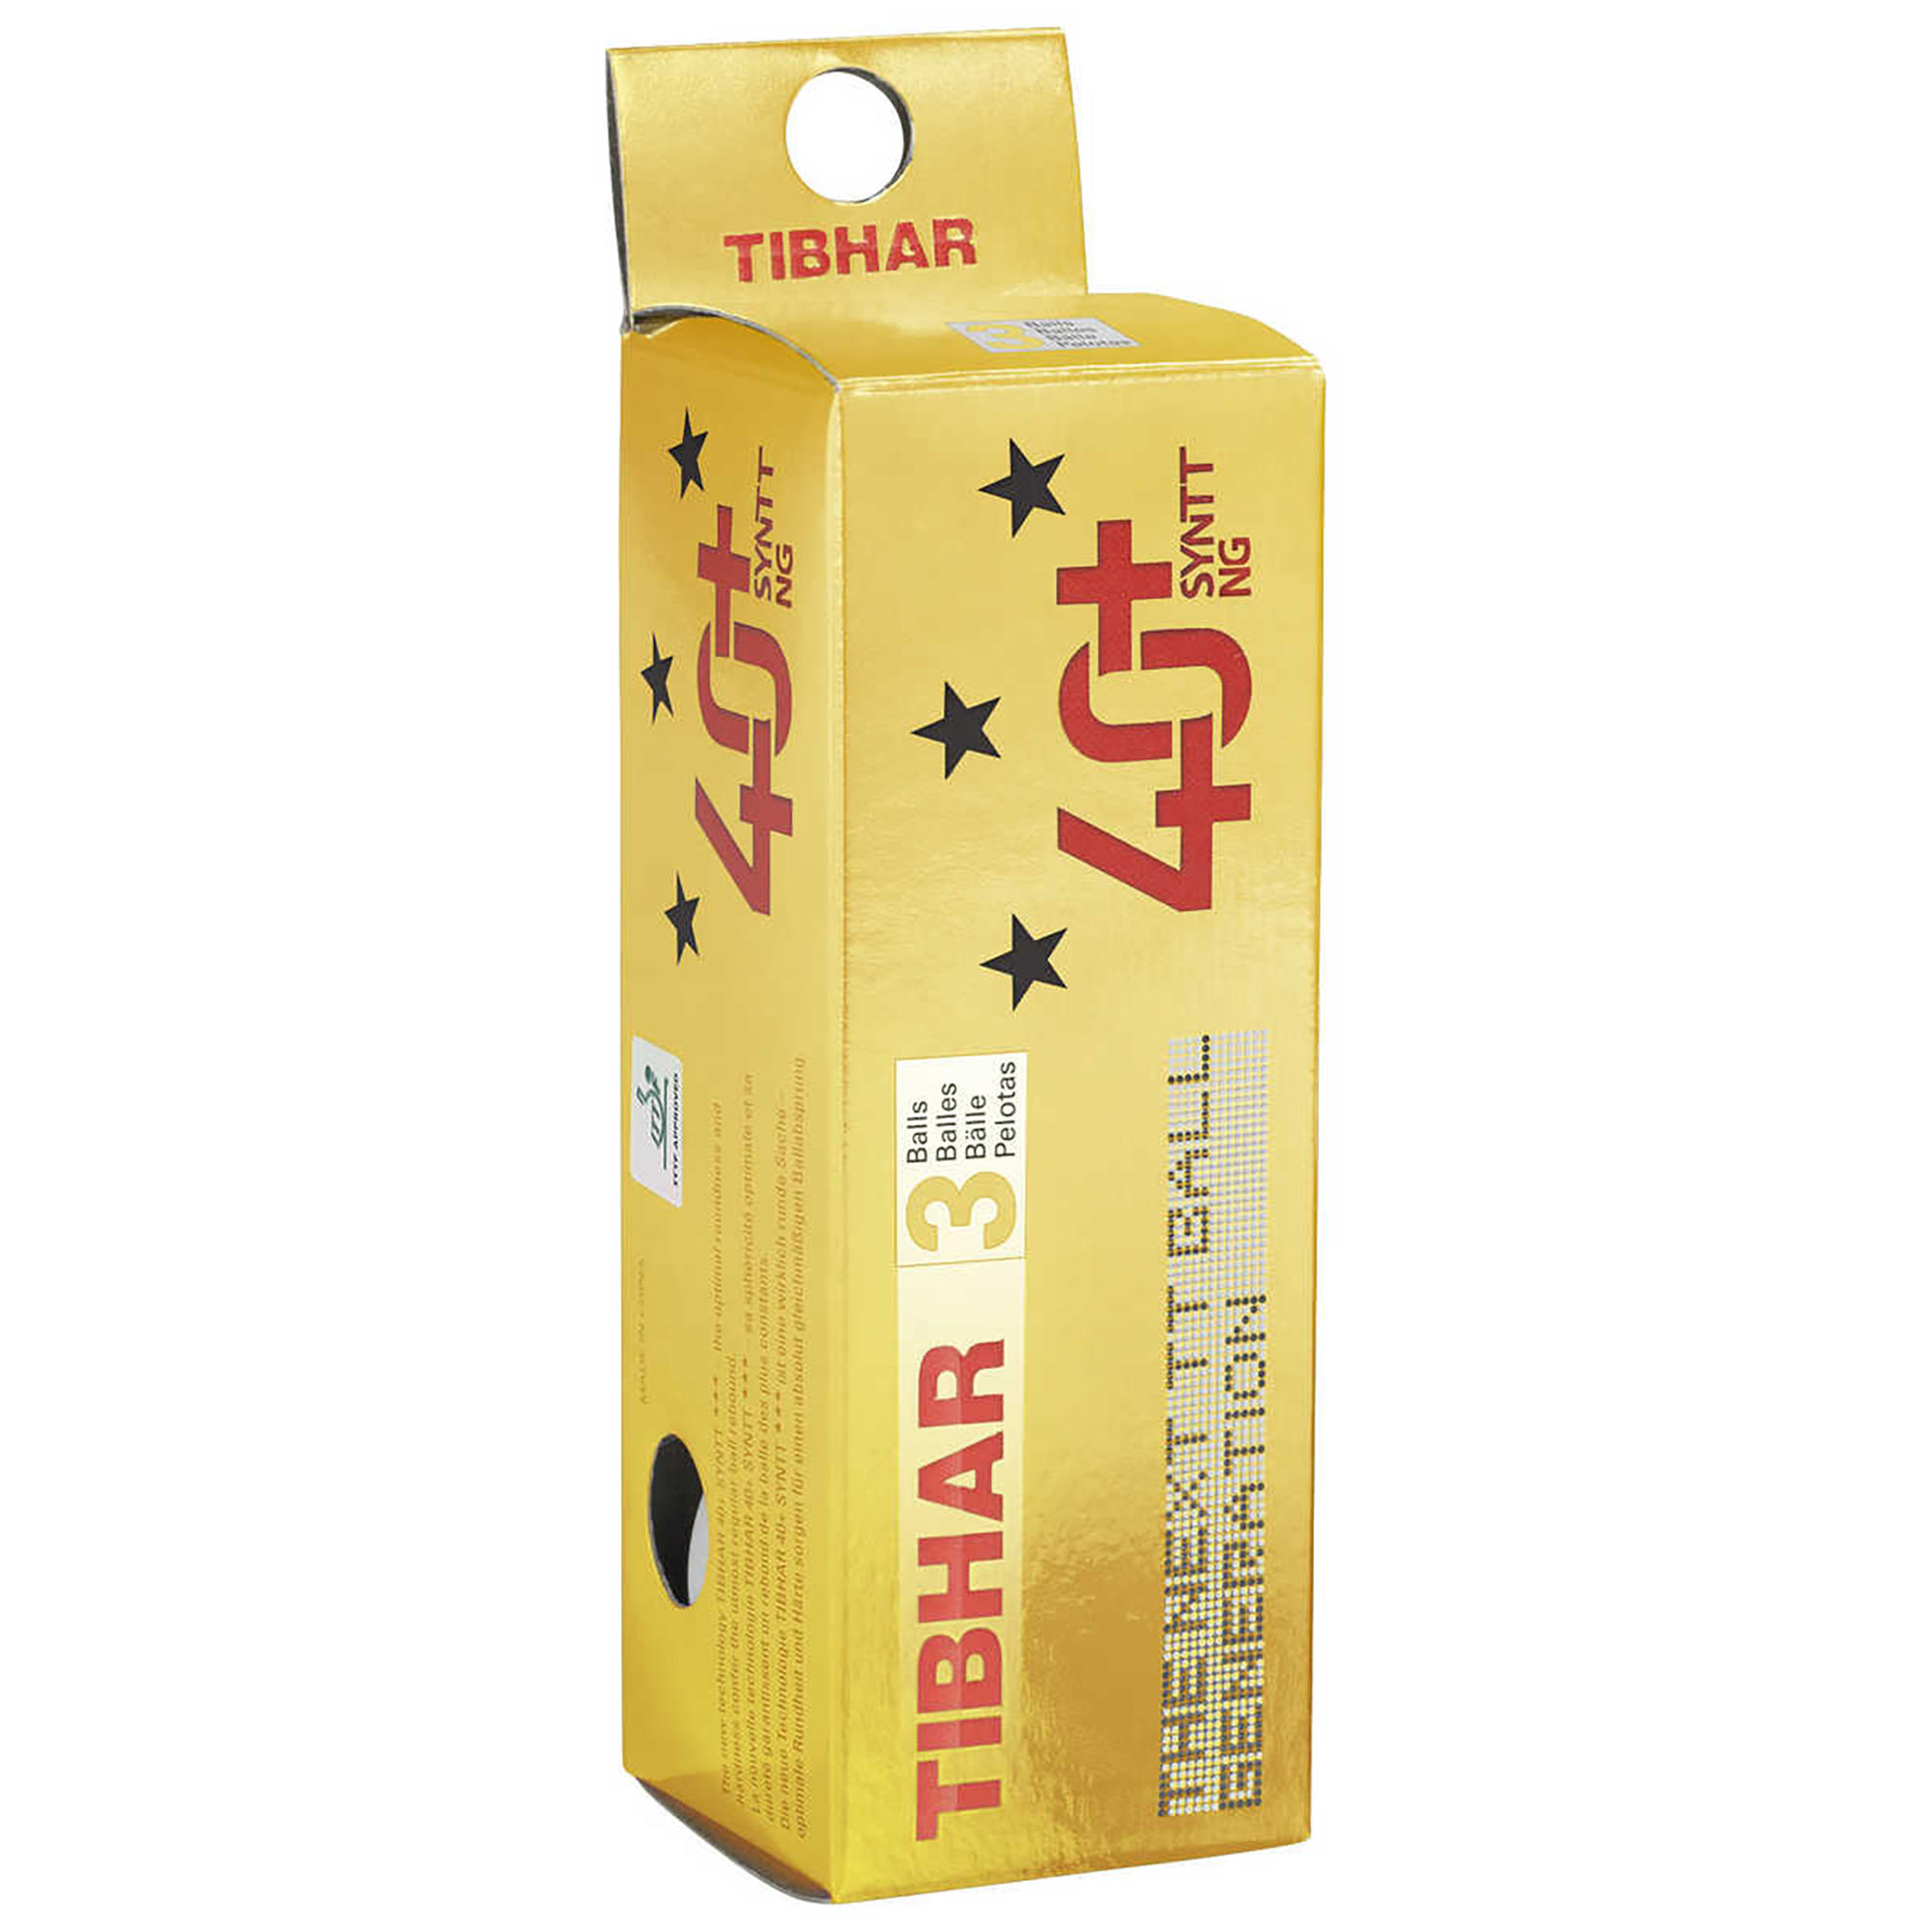 Tibhar Tafeltennisballetjes 3 ster 40+ SYNTT NG x3 wit